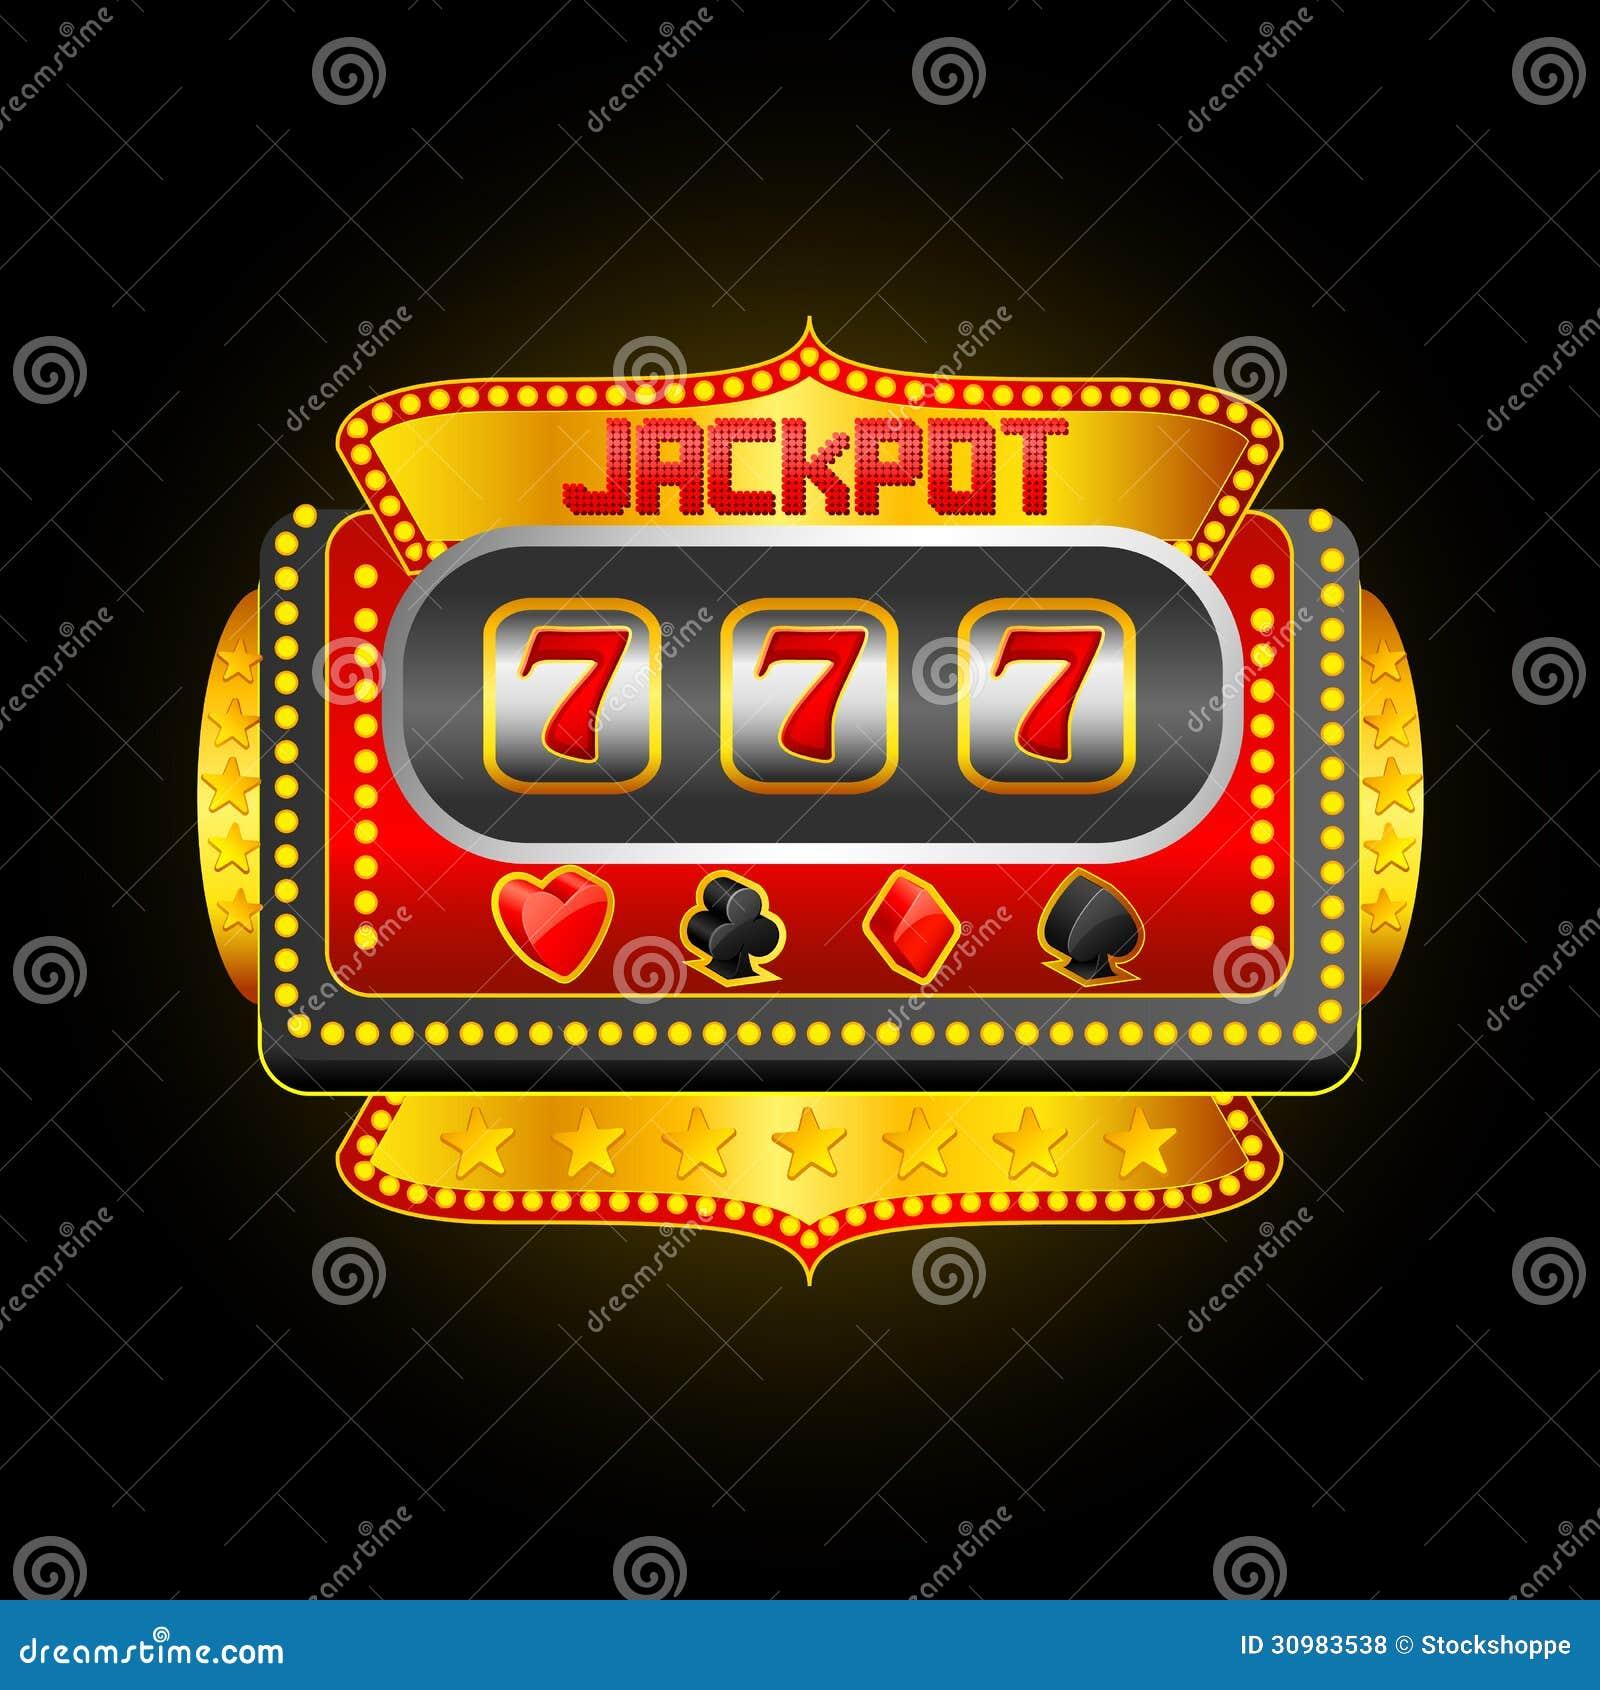 Slot Machine 2770